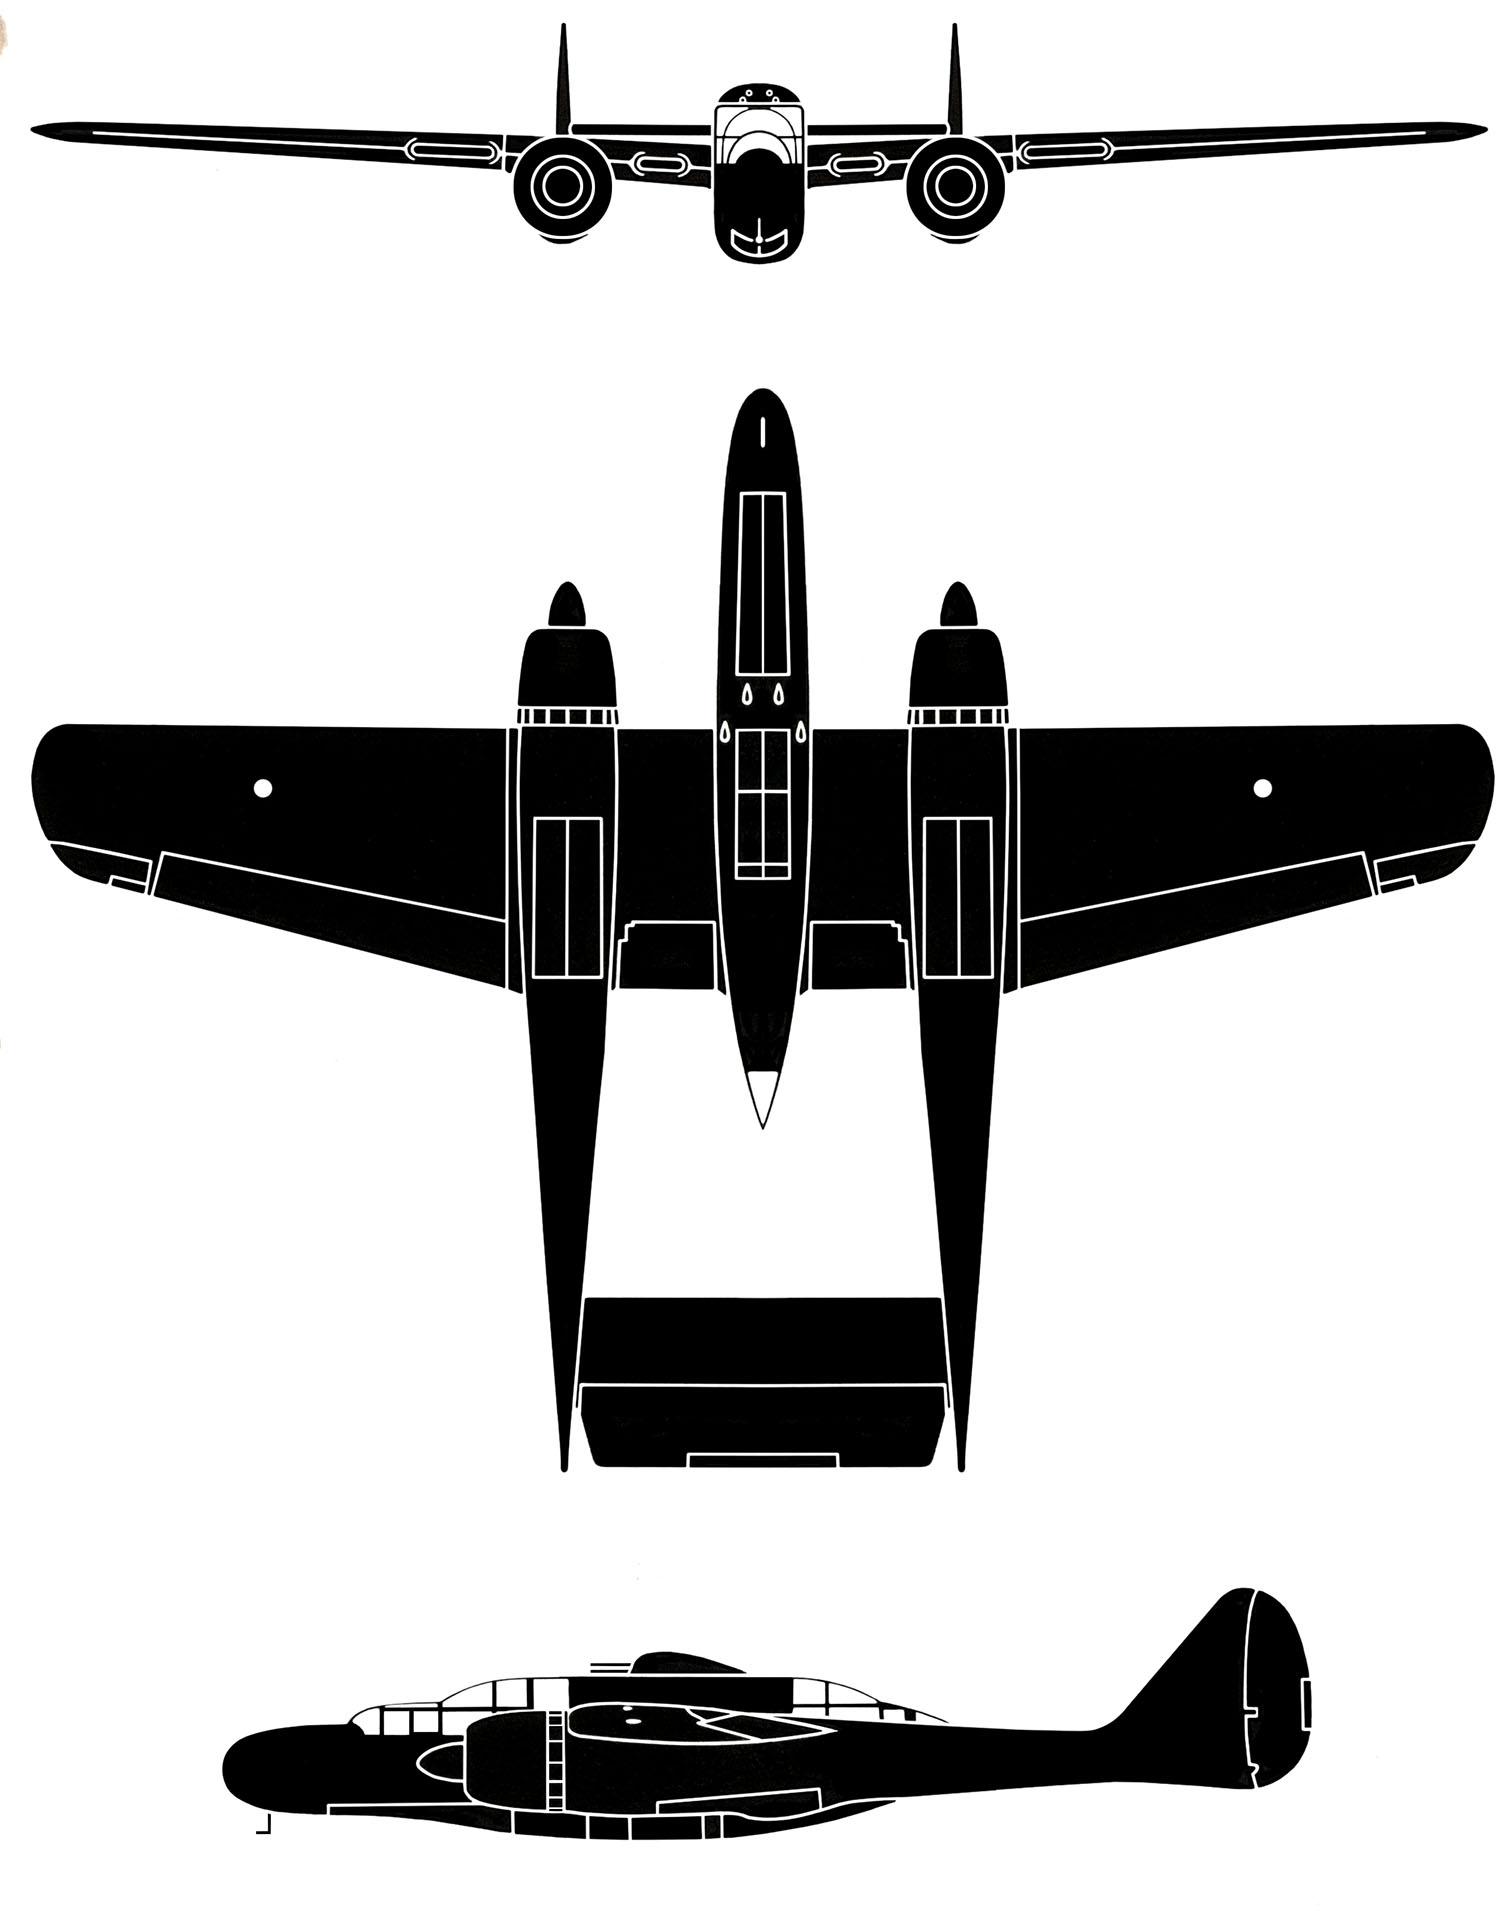 P-61 Blackwidow